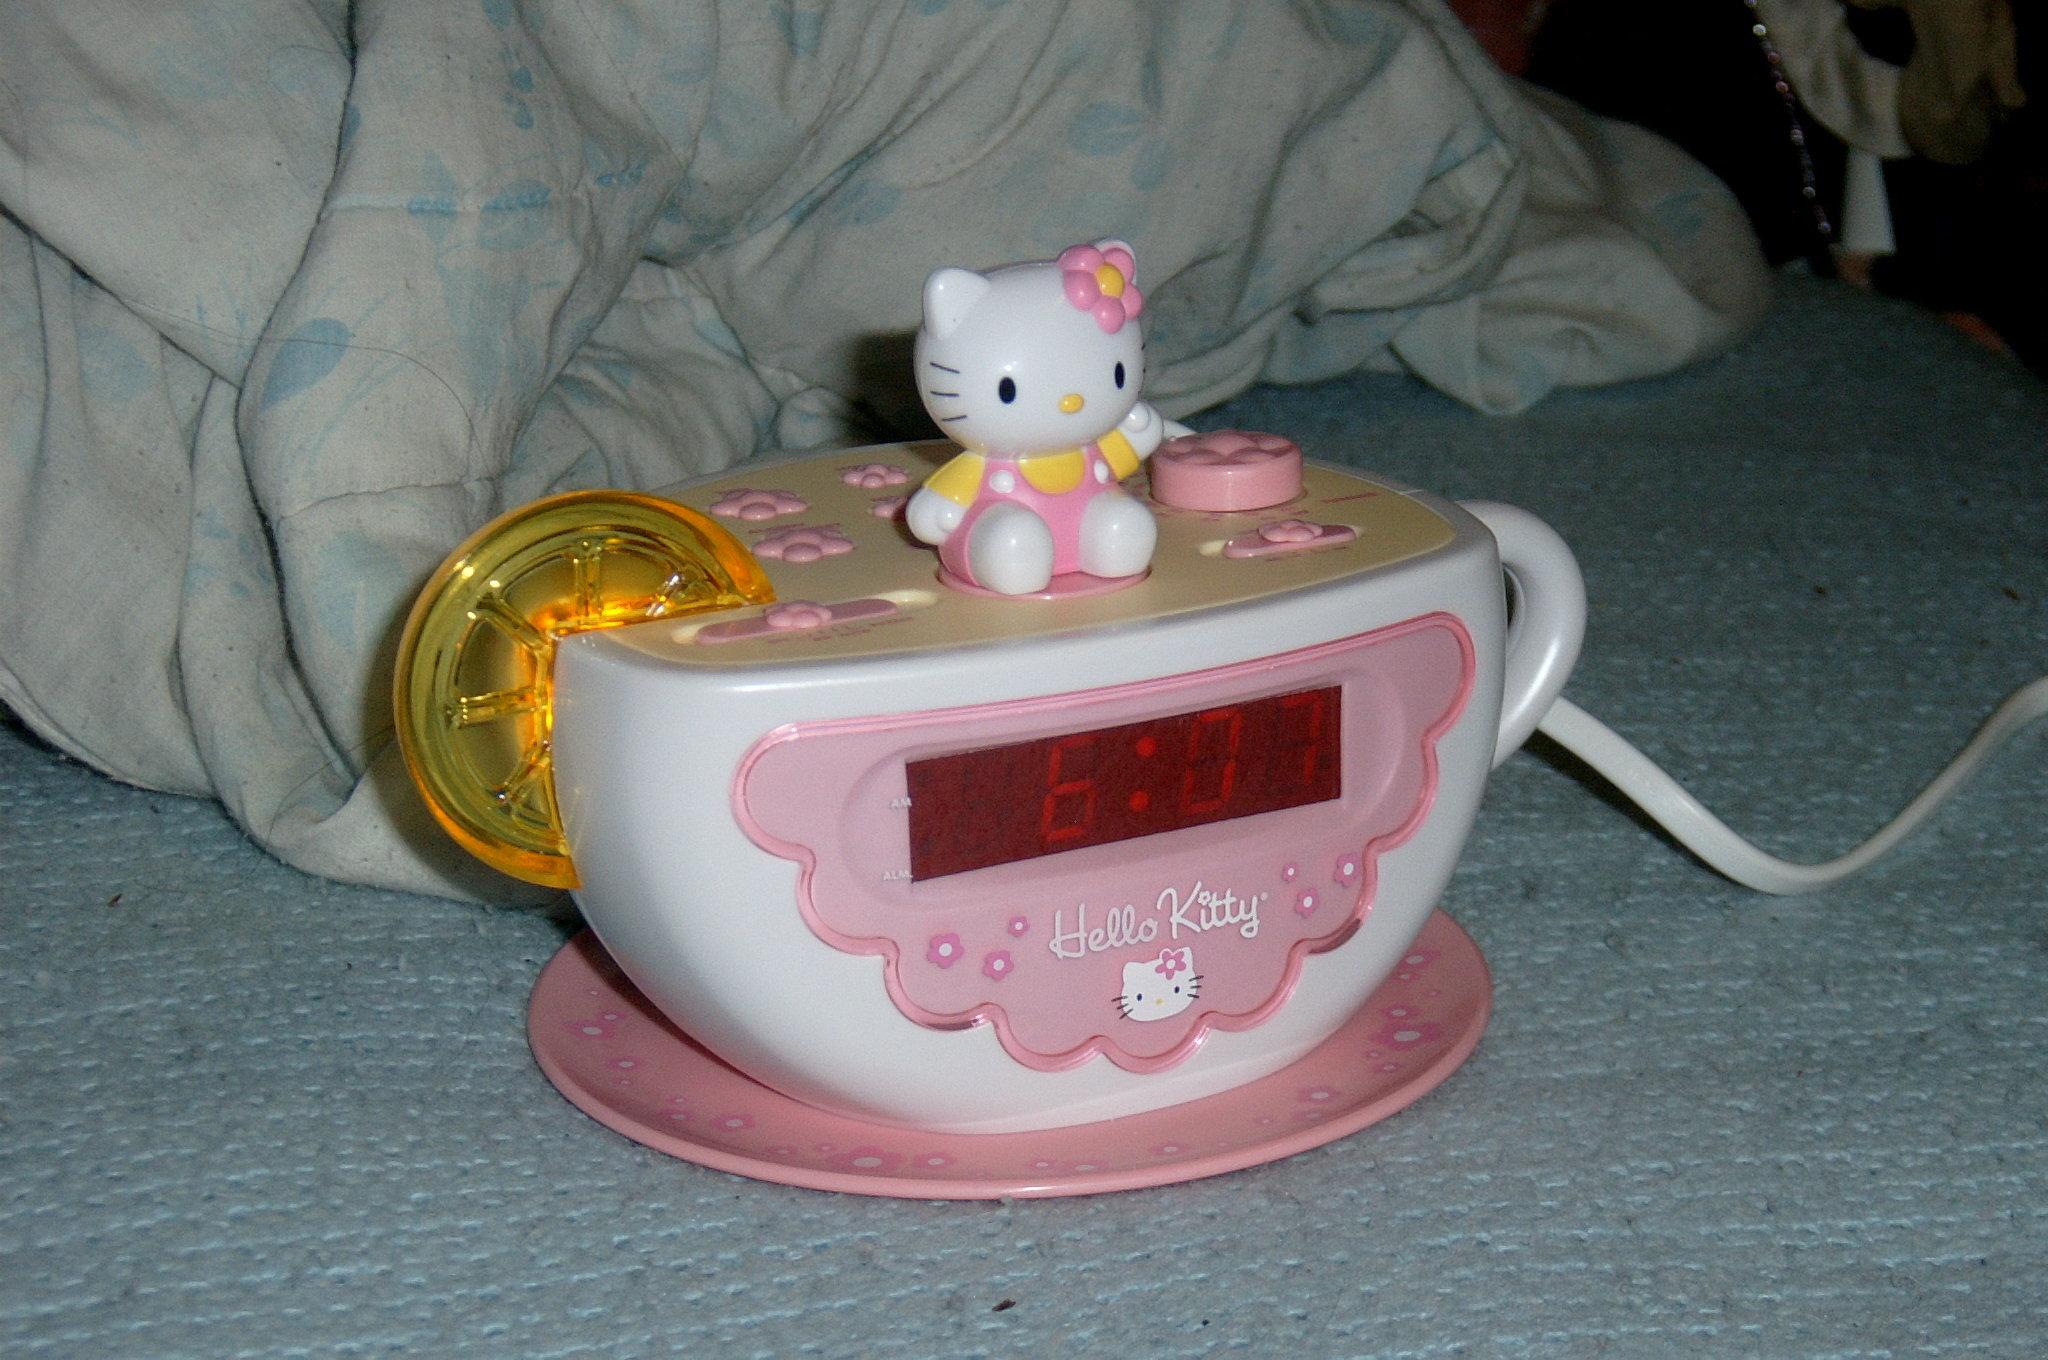 Herro Kitty Teacup Clock